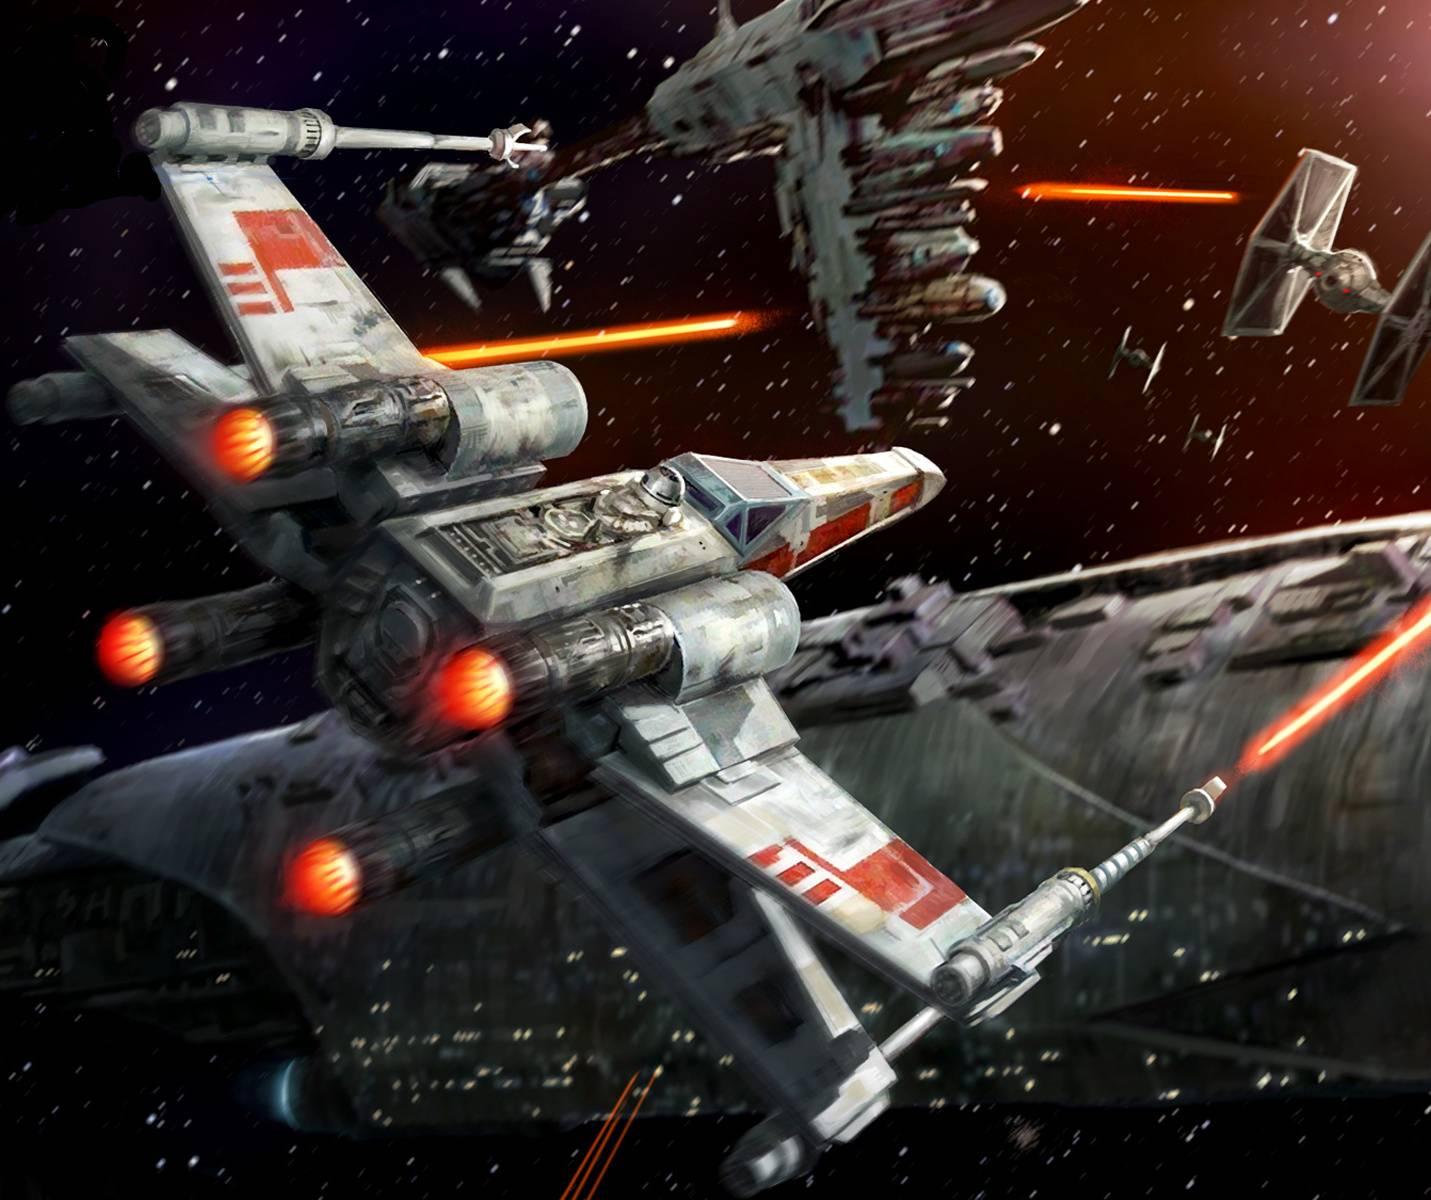 Star Wars Battle Wallpaper By Nightwing3 1a Free On Zedge